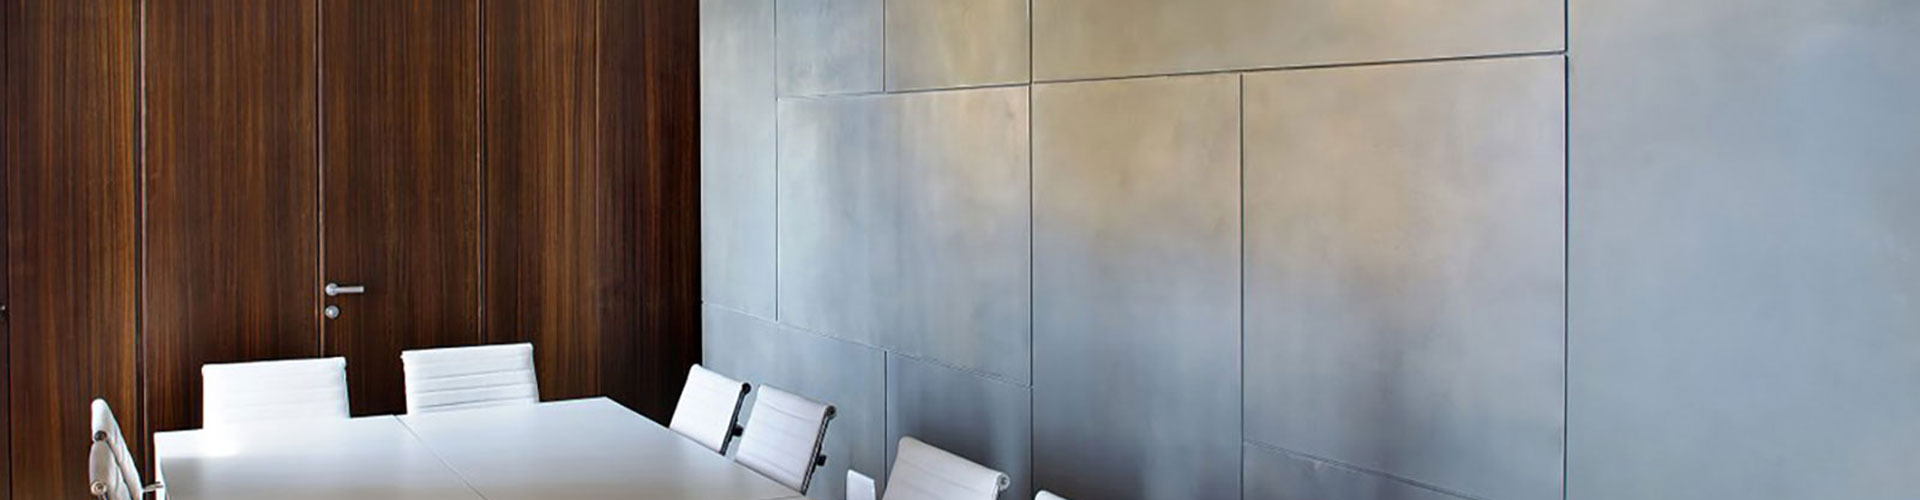 microtopping-concrete-design_-By-BETONADA-(B1)